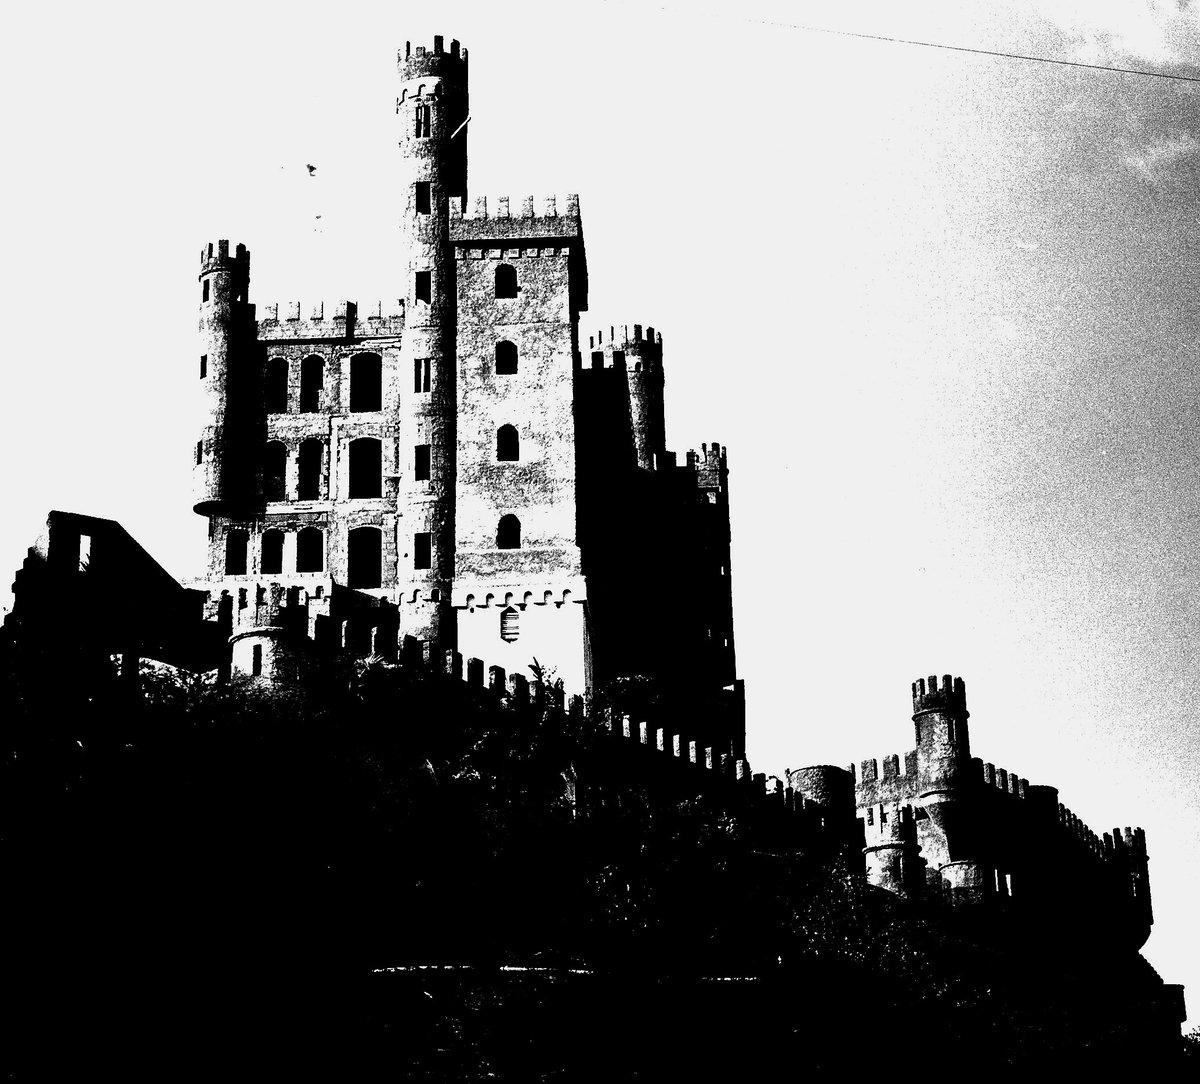 Fotografía analógica de Pedro Antonuccio Sanó. Castillo de Las Salinas / Castillo de Tacoa #estadovargas #estadolaguaira #marcaribe #venezuela 1996 #summer #amazingplaces #lugaresincreibles #paradise #photography #photos #photo #fotos #foto #caribevenezolano #photographie #PHOTOSpic.twitter.com/ENfO3ZwUwC